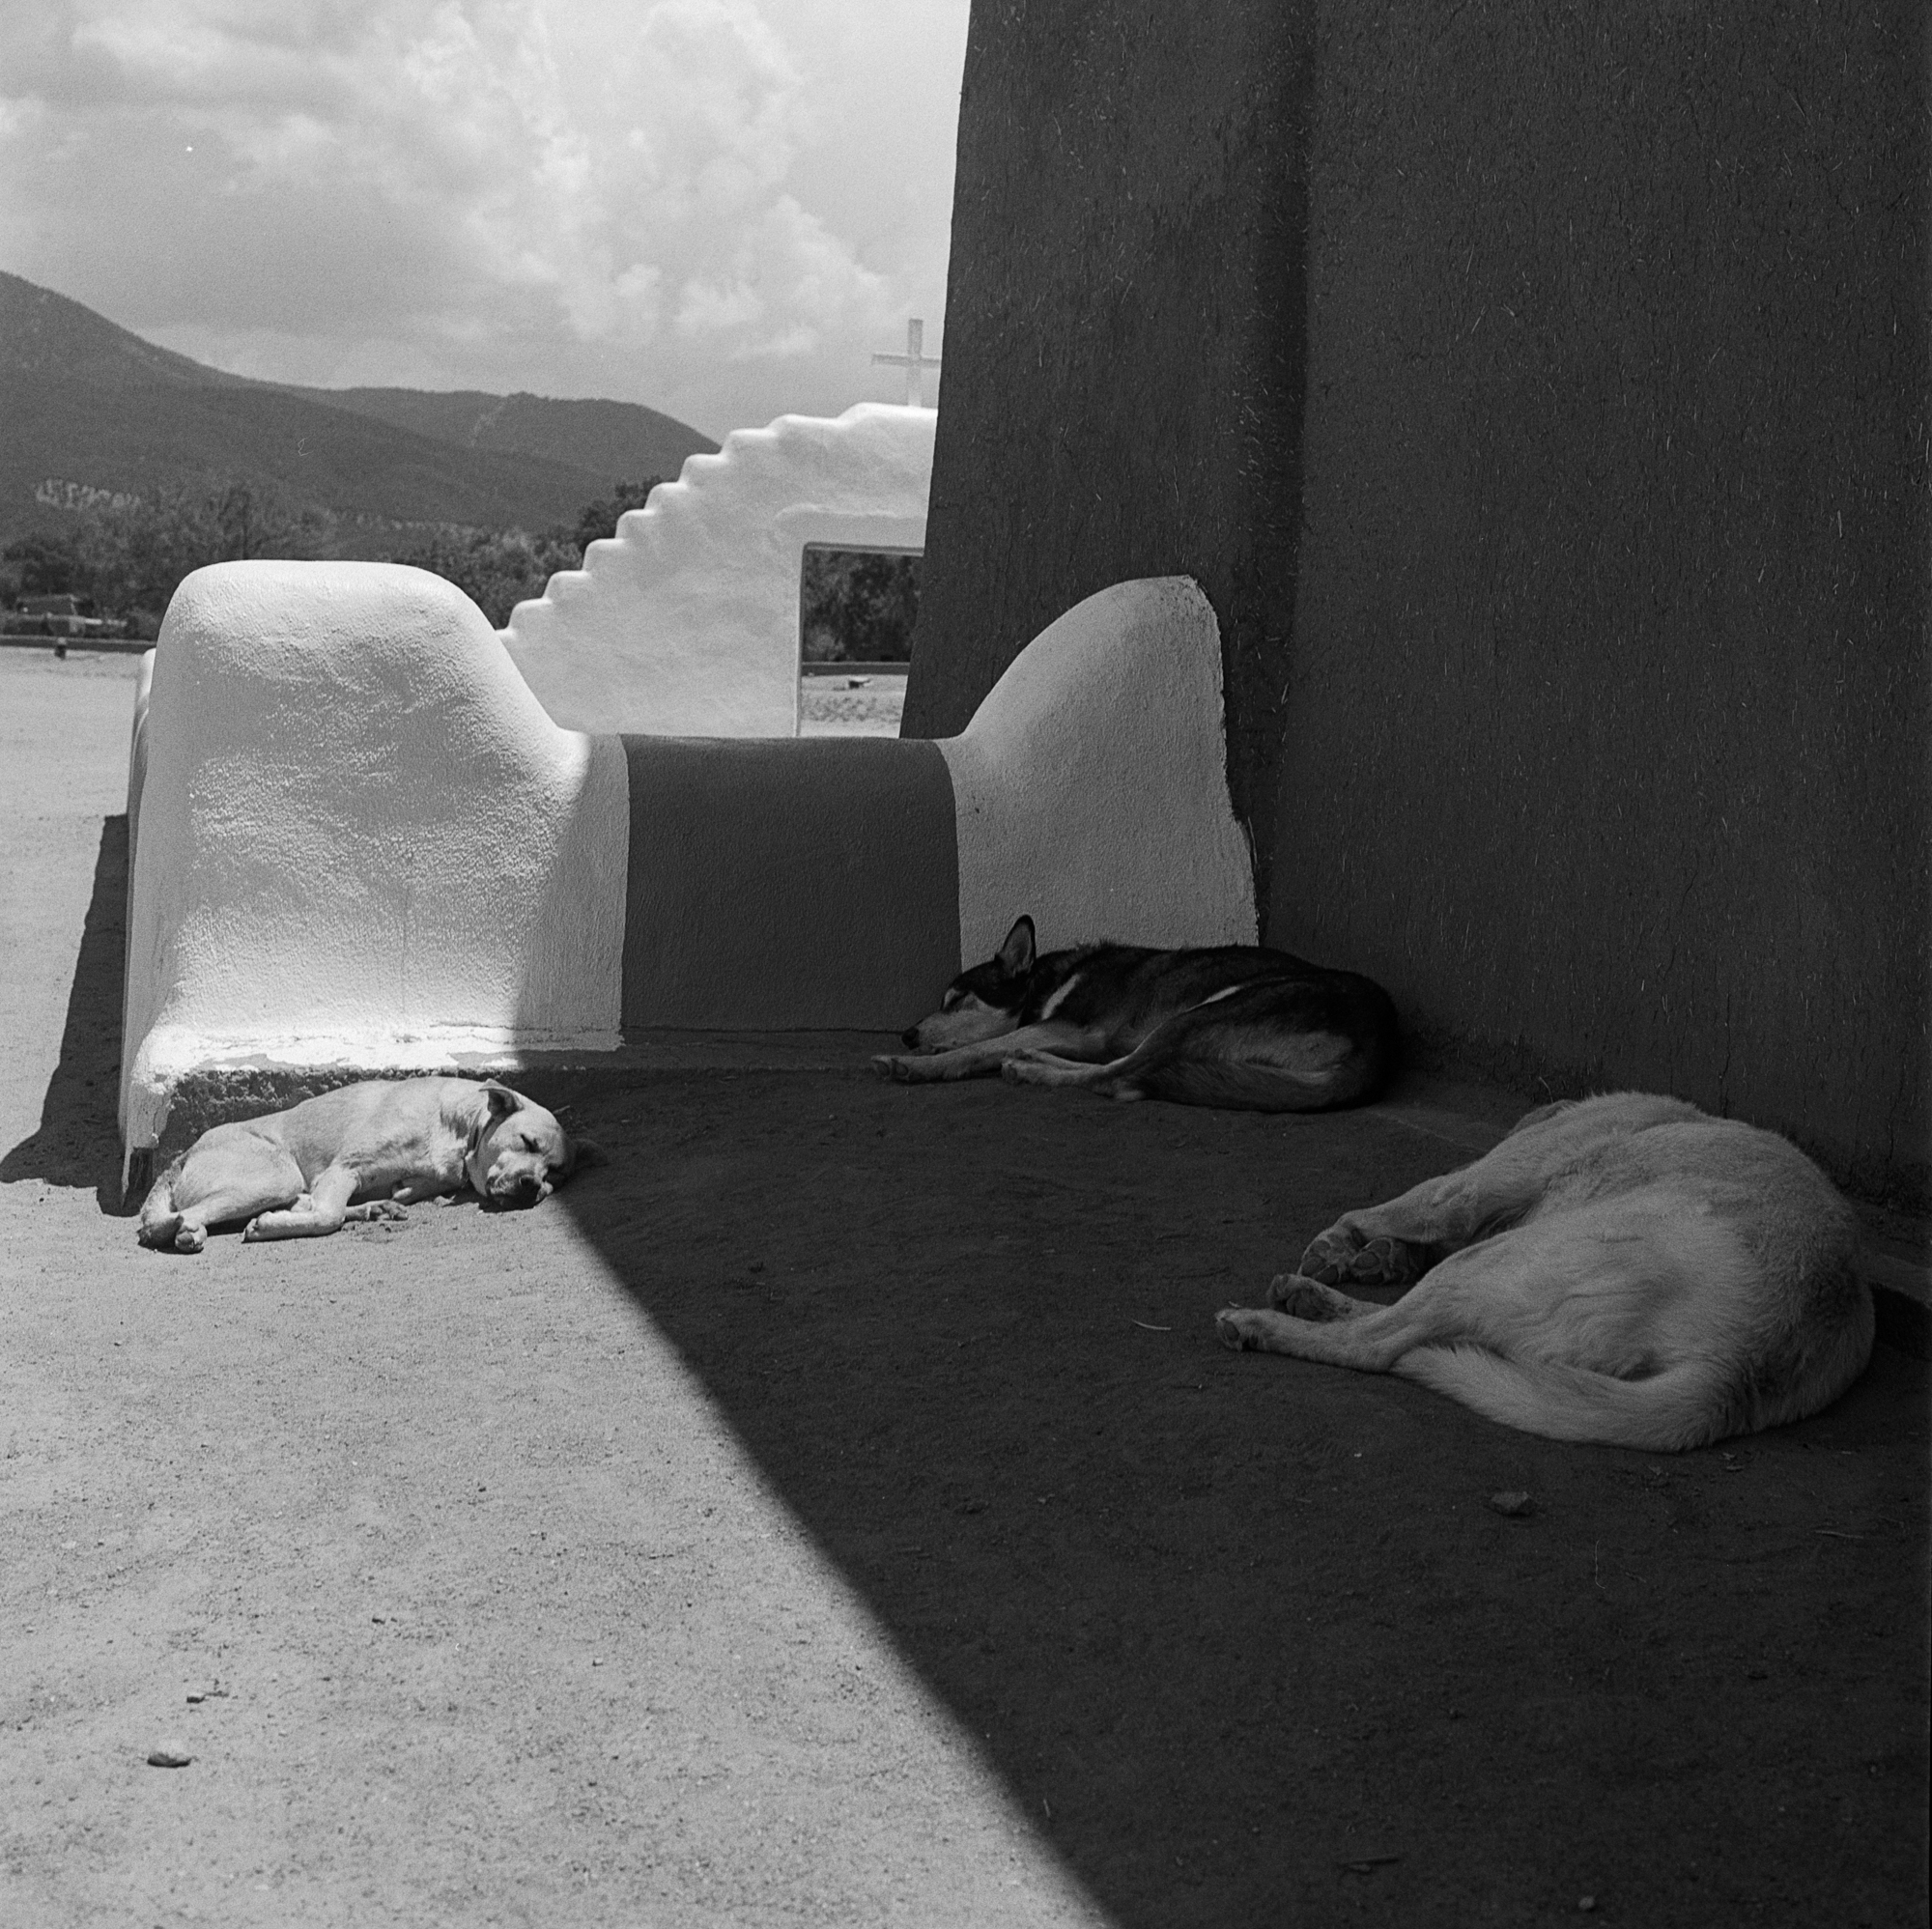 Taos Dogs   Hasselblad 500 cm   Tri-X   Amy Jasek